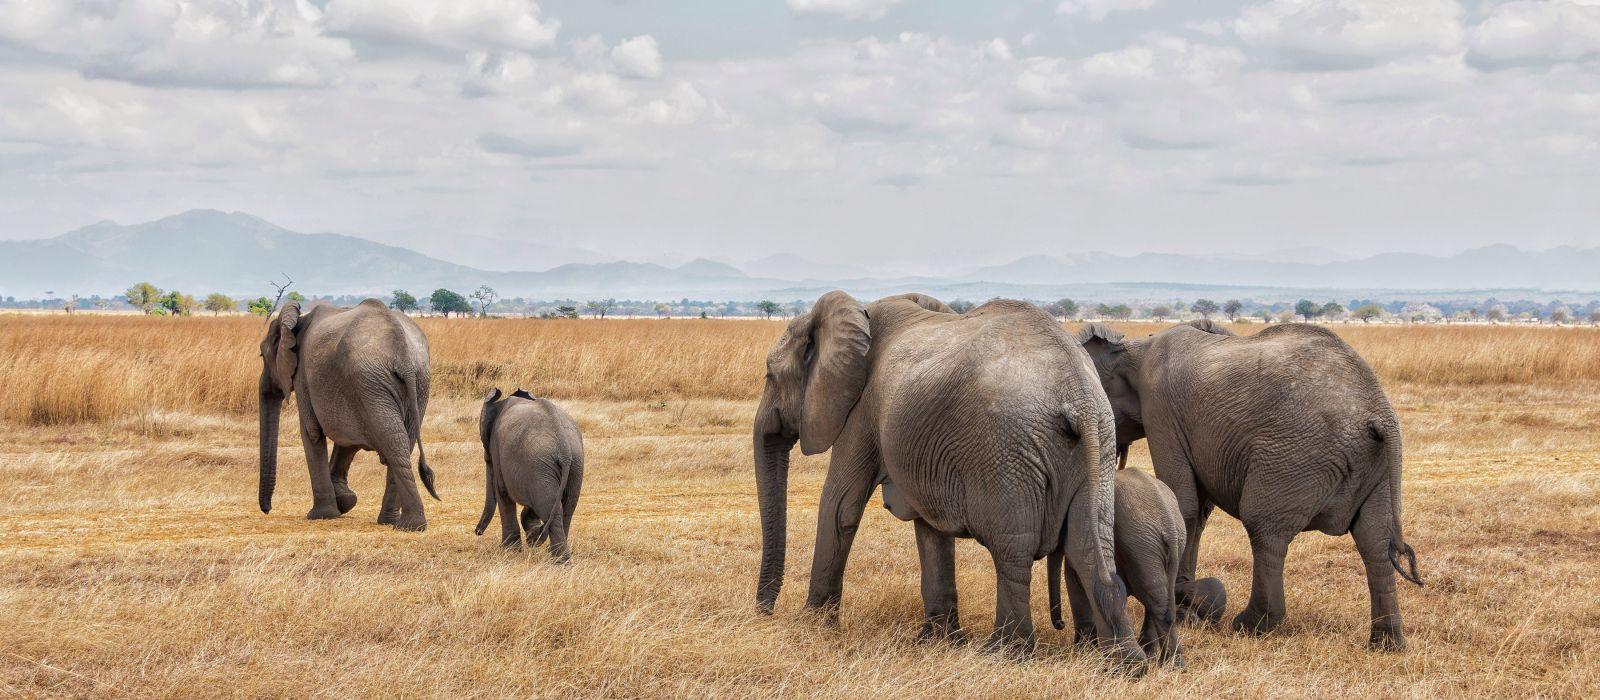 Elefanten bei einer Reihenwanderung im Mikumi-Nationalpark, Tansania, Afrika